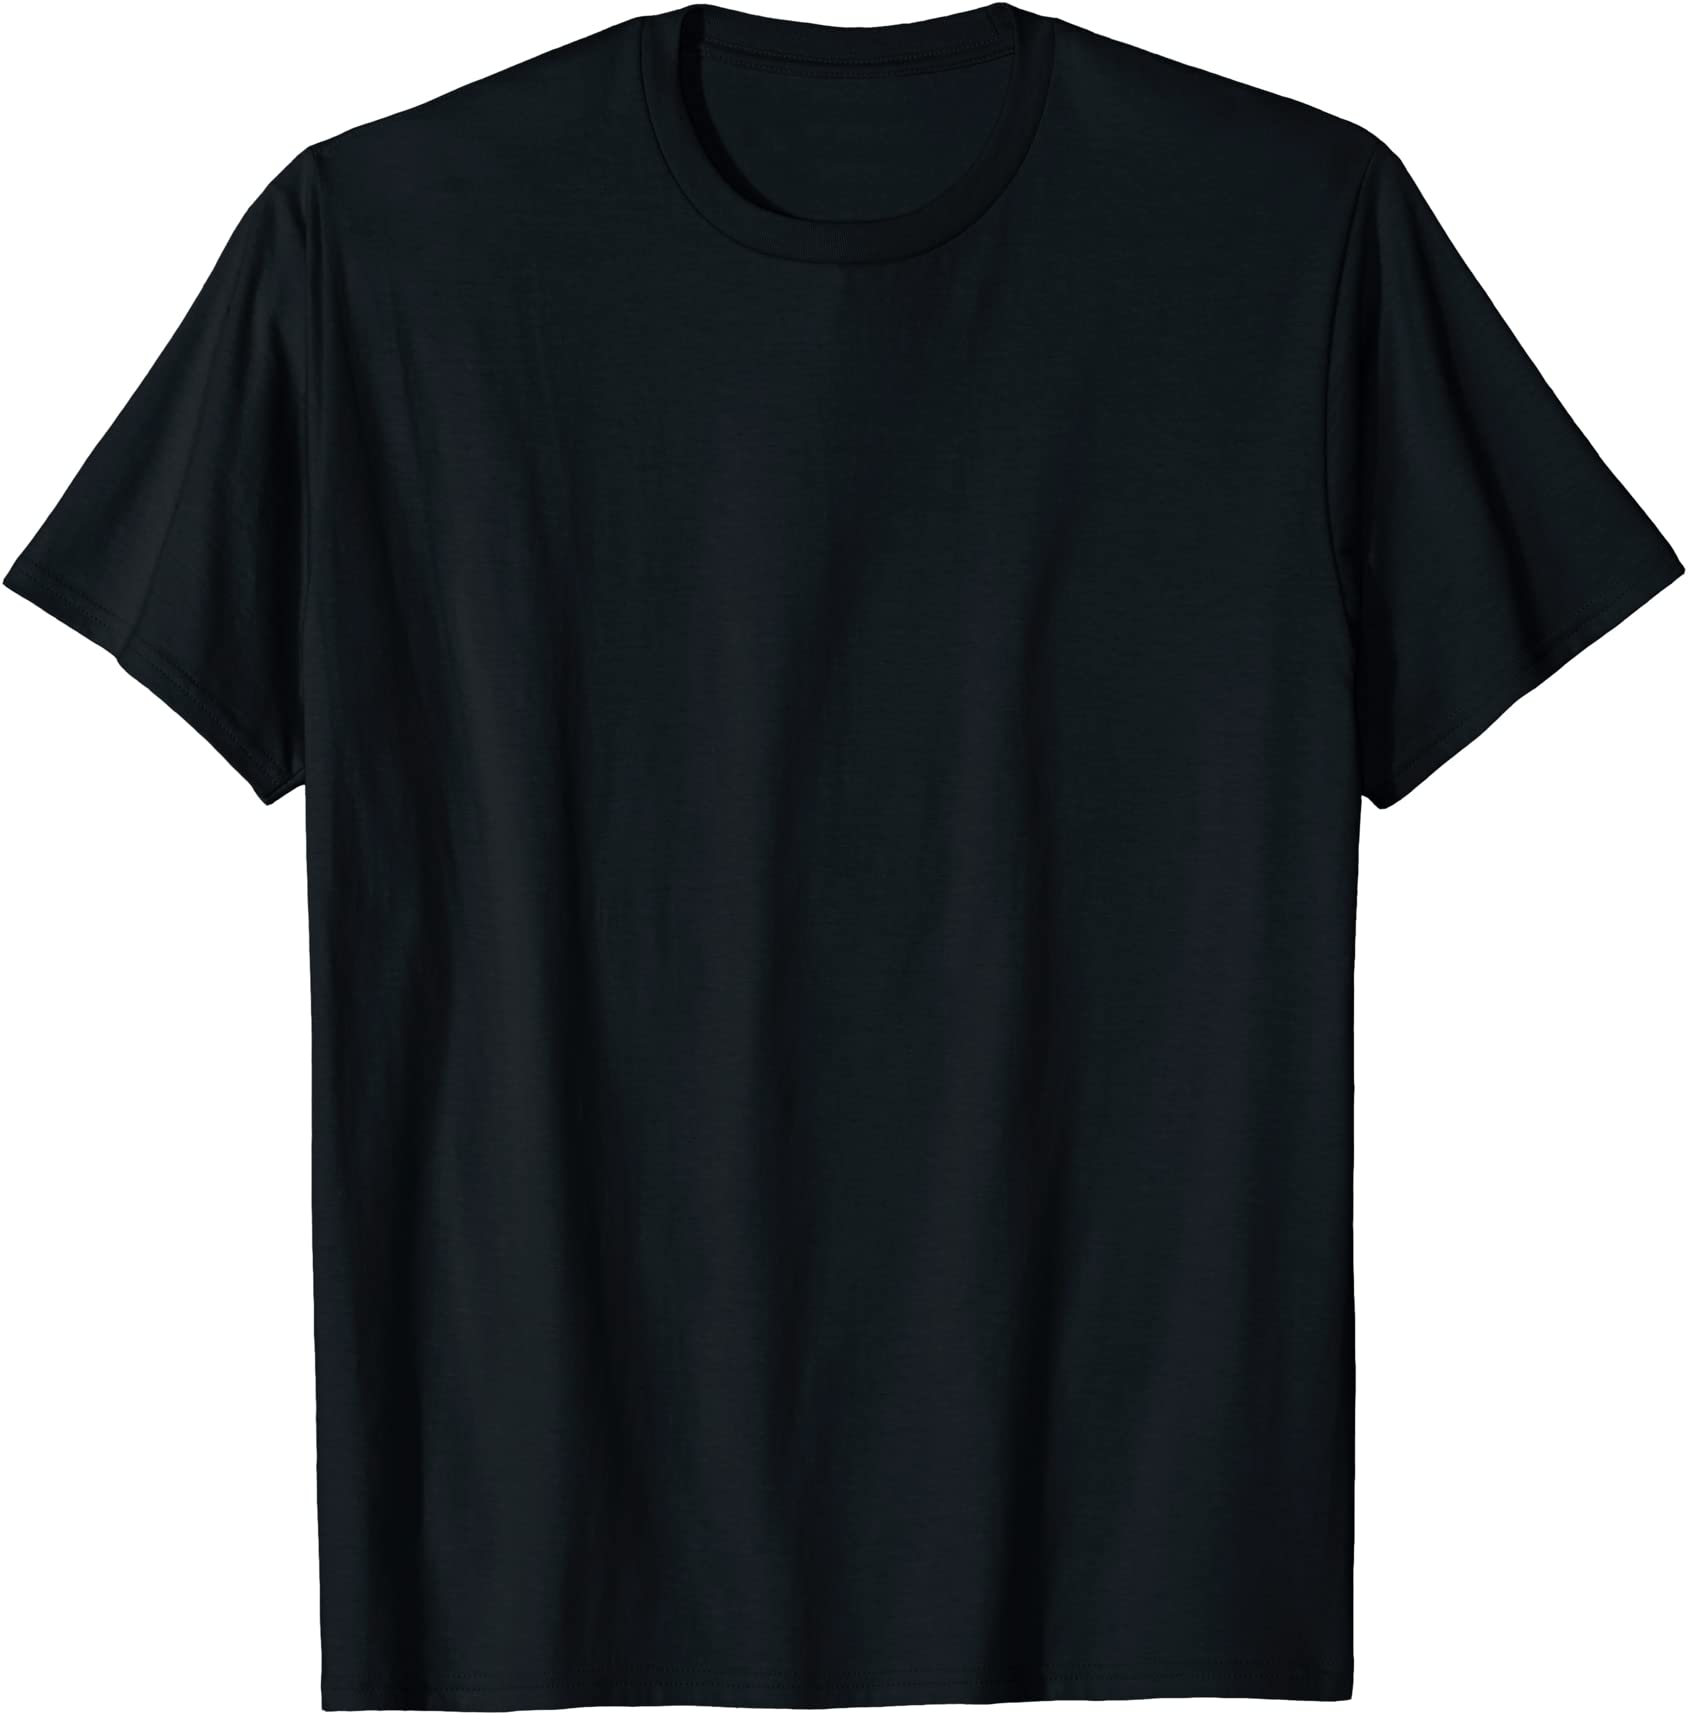 I/'m Not Crazy I/'m Just a Pisces Boys Girls Kids Childrens T-Shirt